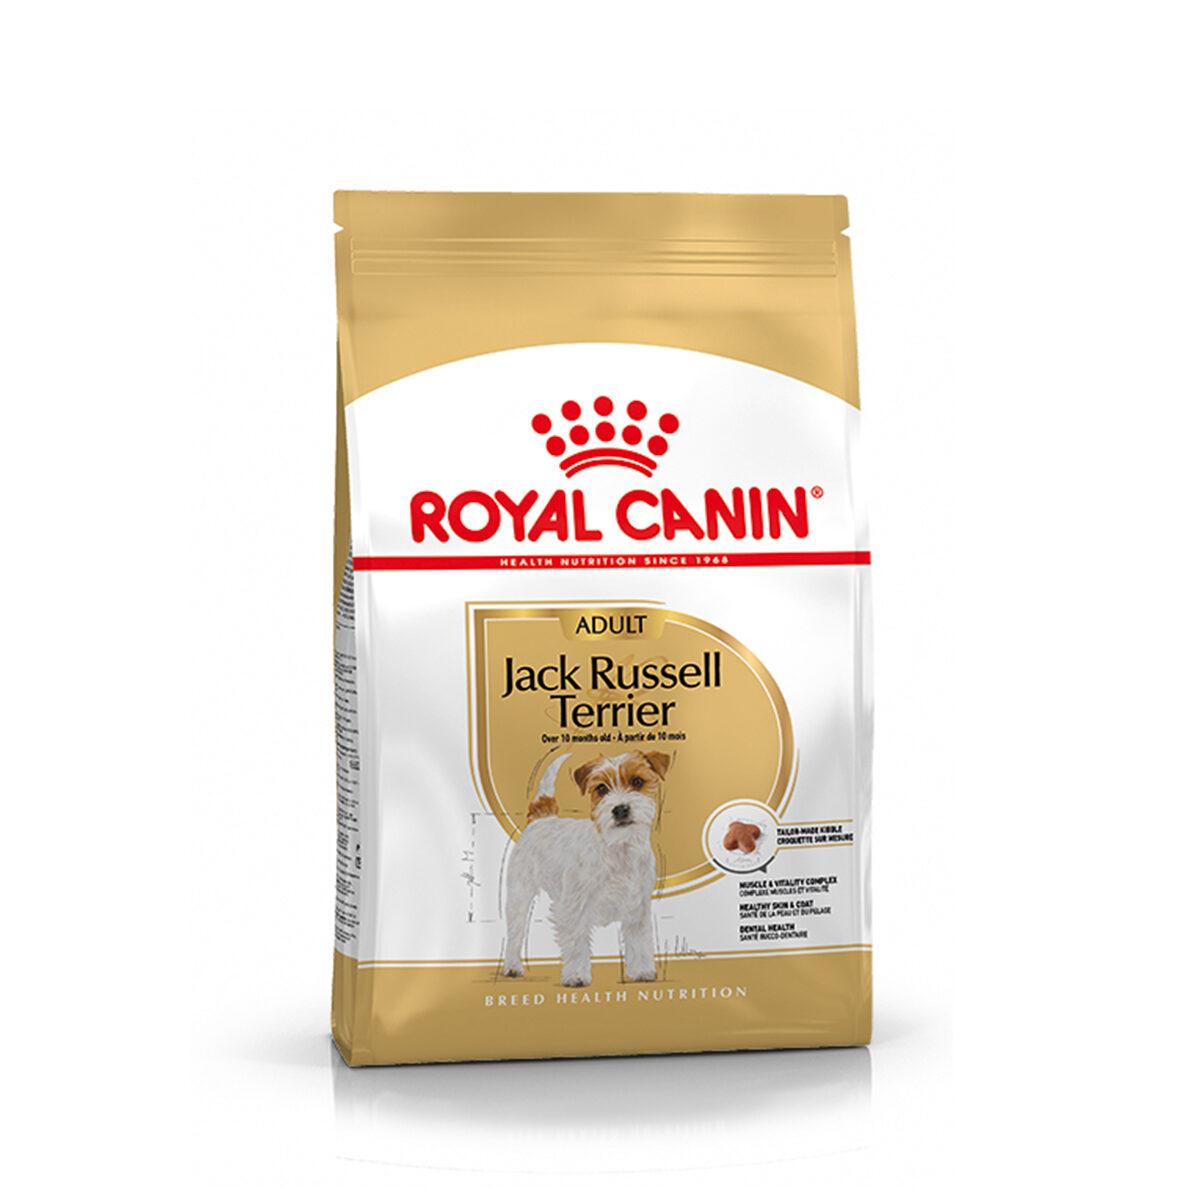 Royal Canin Jack Russell Terrier Adult Hondenvoer 1,5 kg